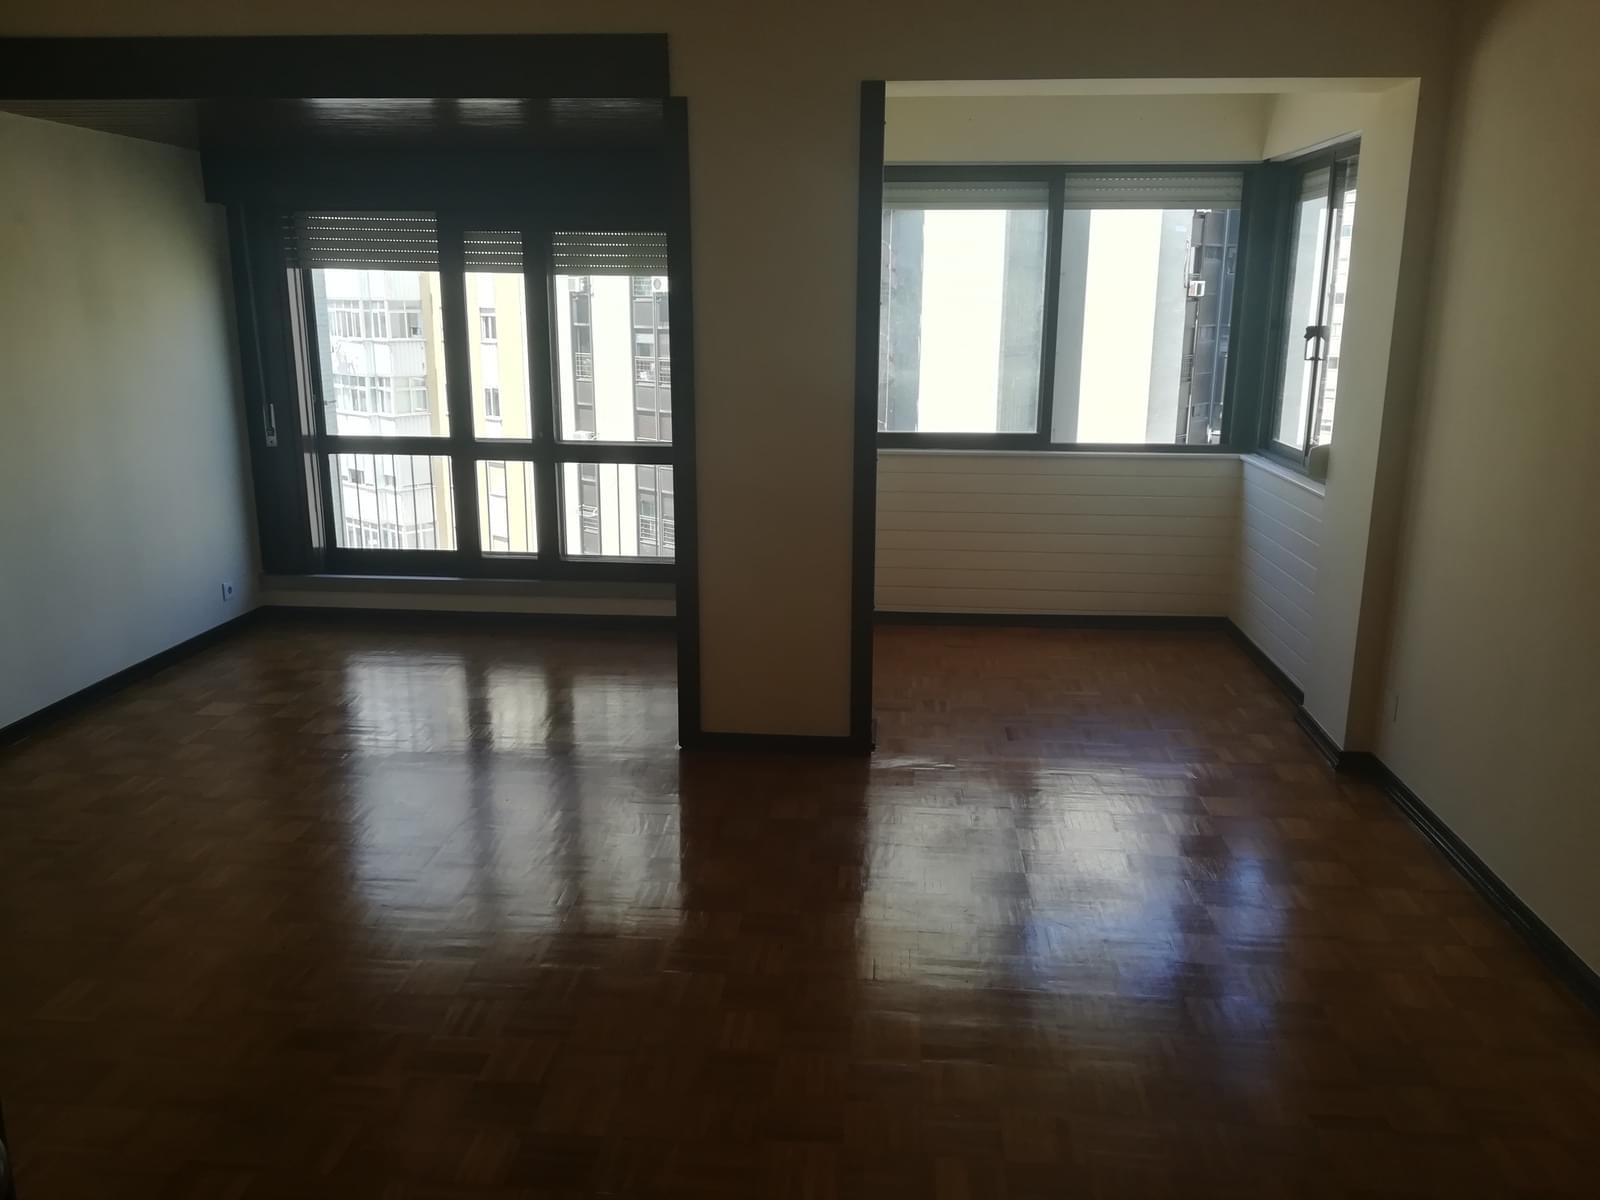 pf17568-apartamento-t3-oeiras-56a120c2-610e-453d-87de-52fa5702fc56